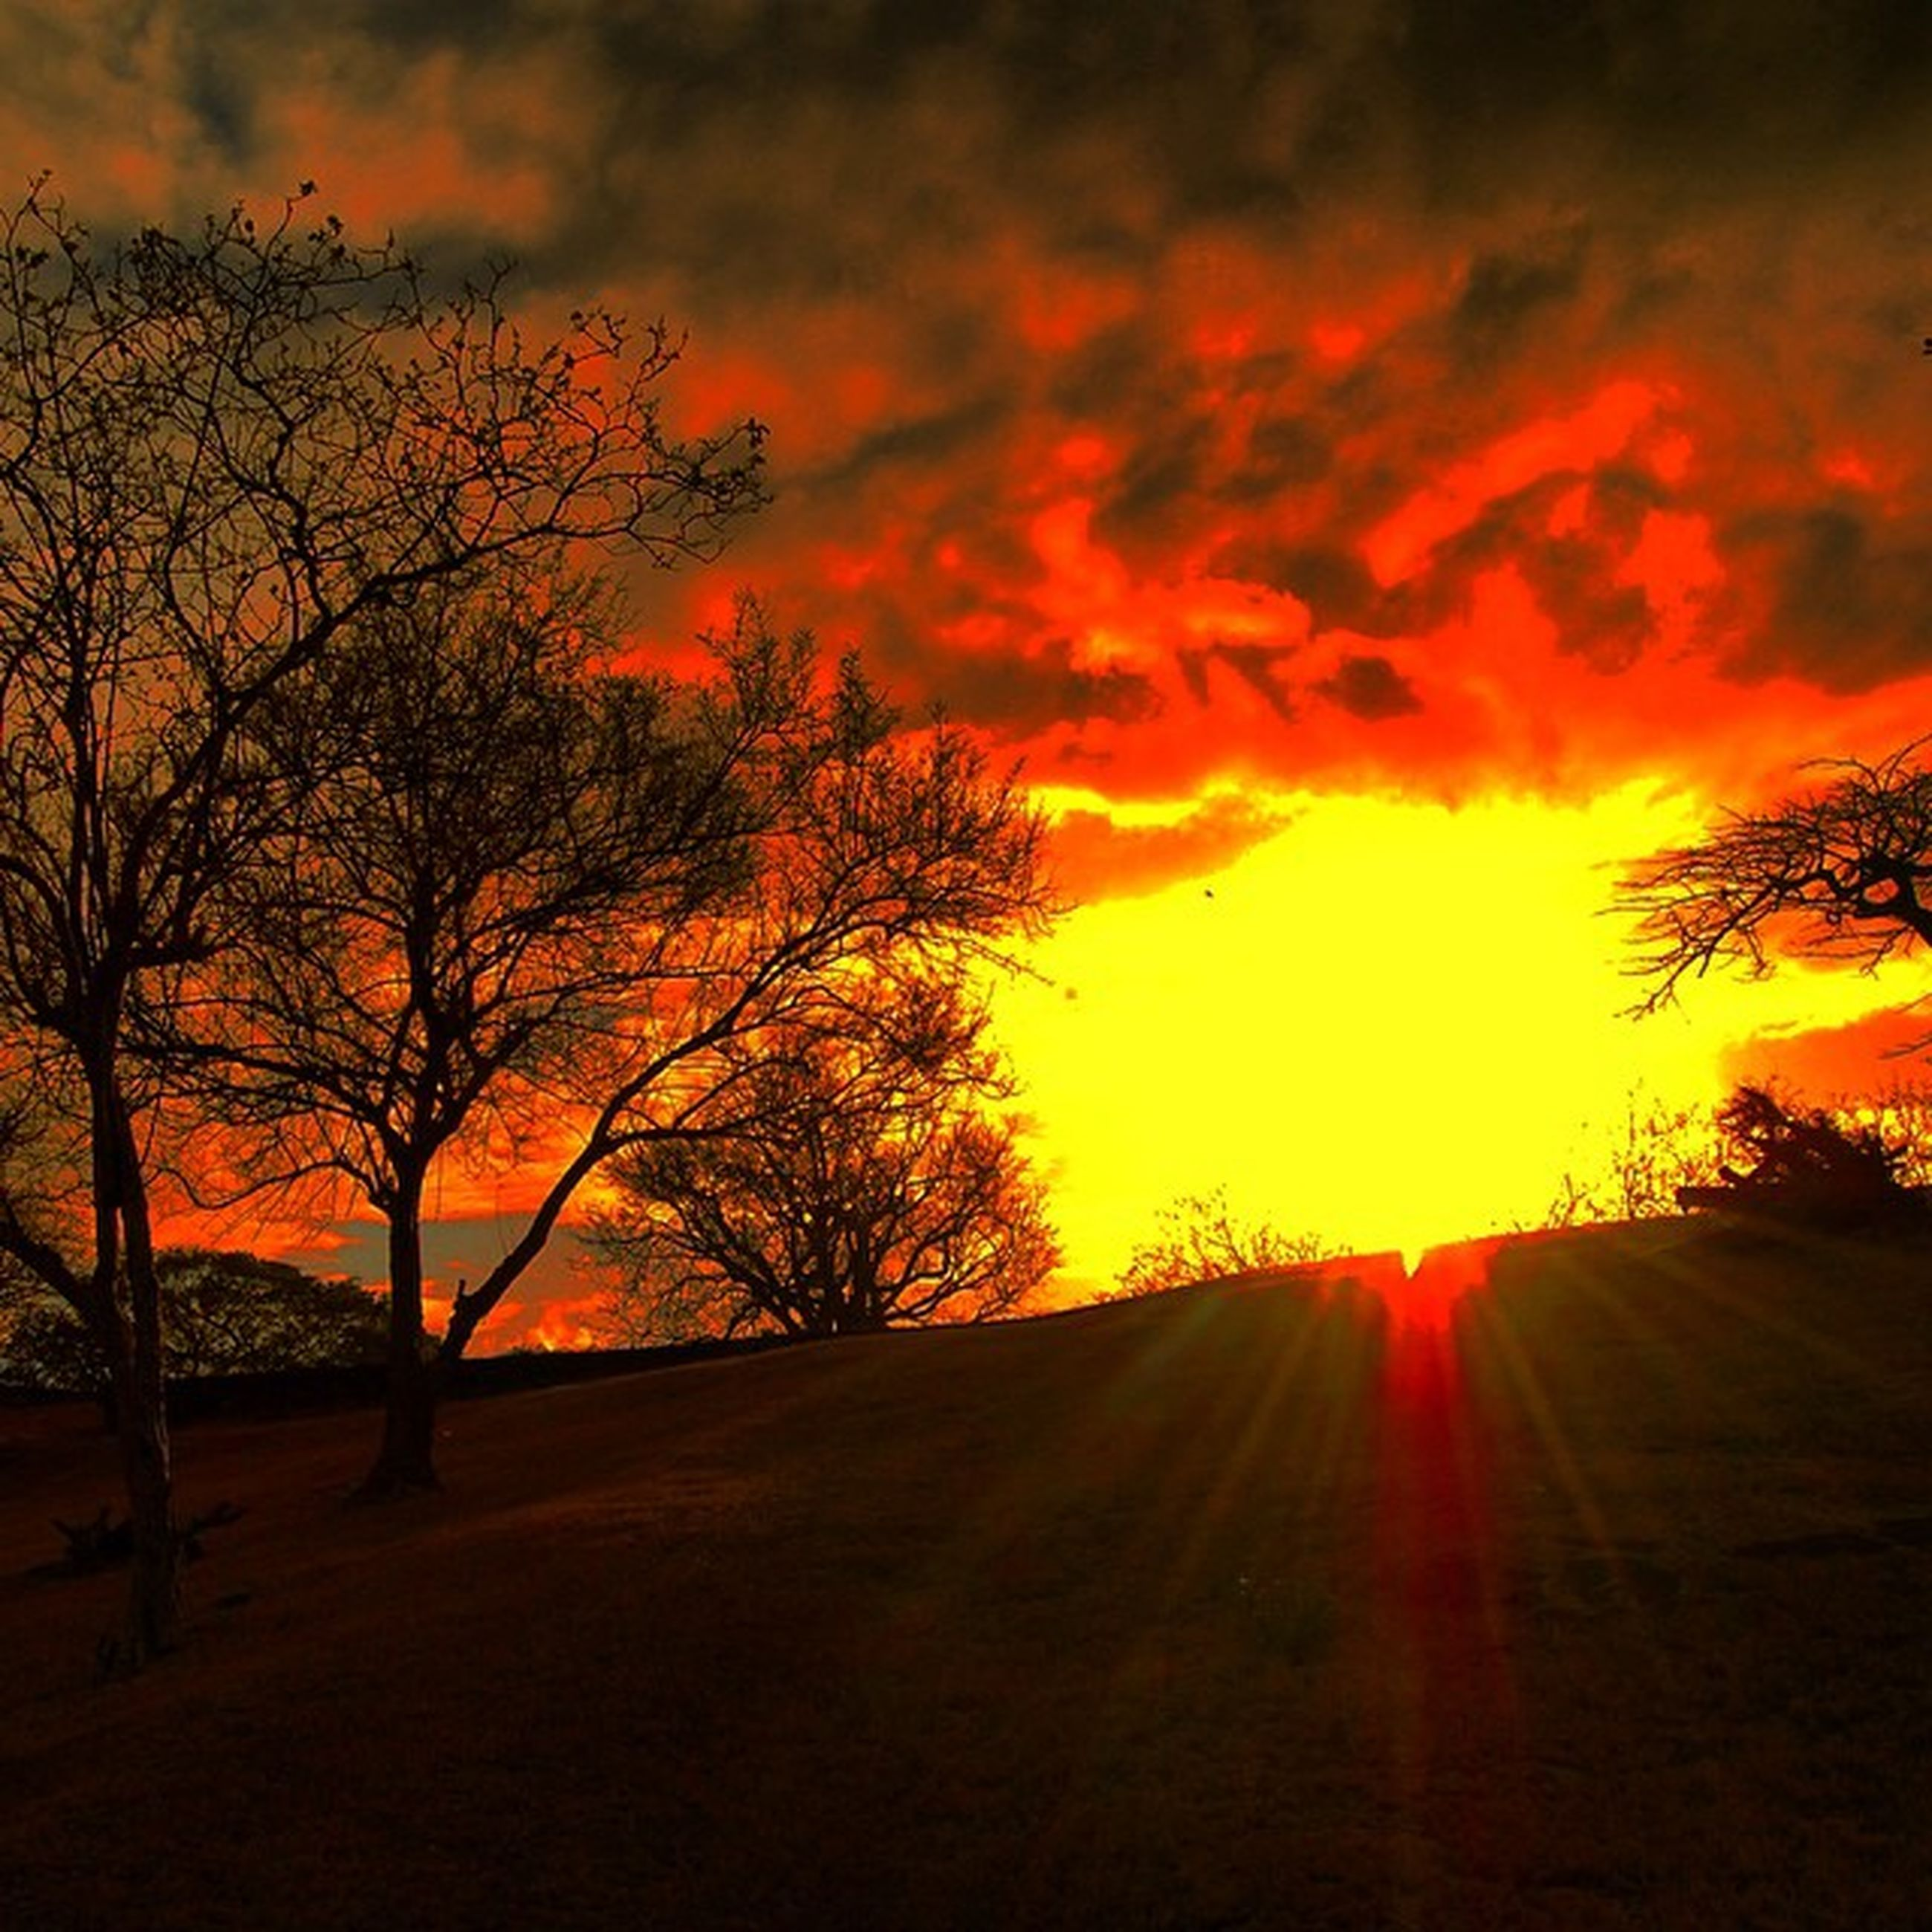 sunset, orange color, sun, sky, beauty in nature, scenics, silhouette, tranquility, tree, tranquil scene, nature, idyllic, cloud - sky, sunlight, dramatic sky, sunbeam, landscape, back lit, outdoors, no people